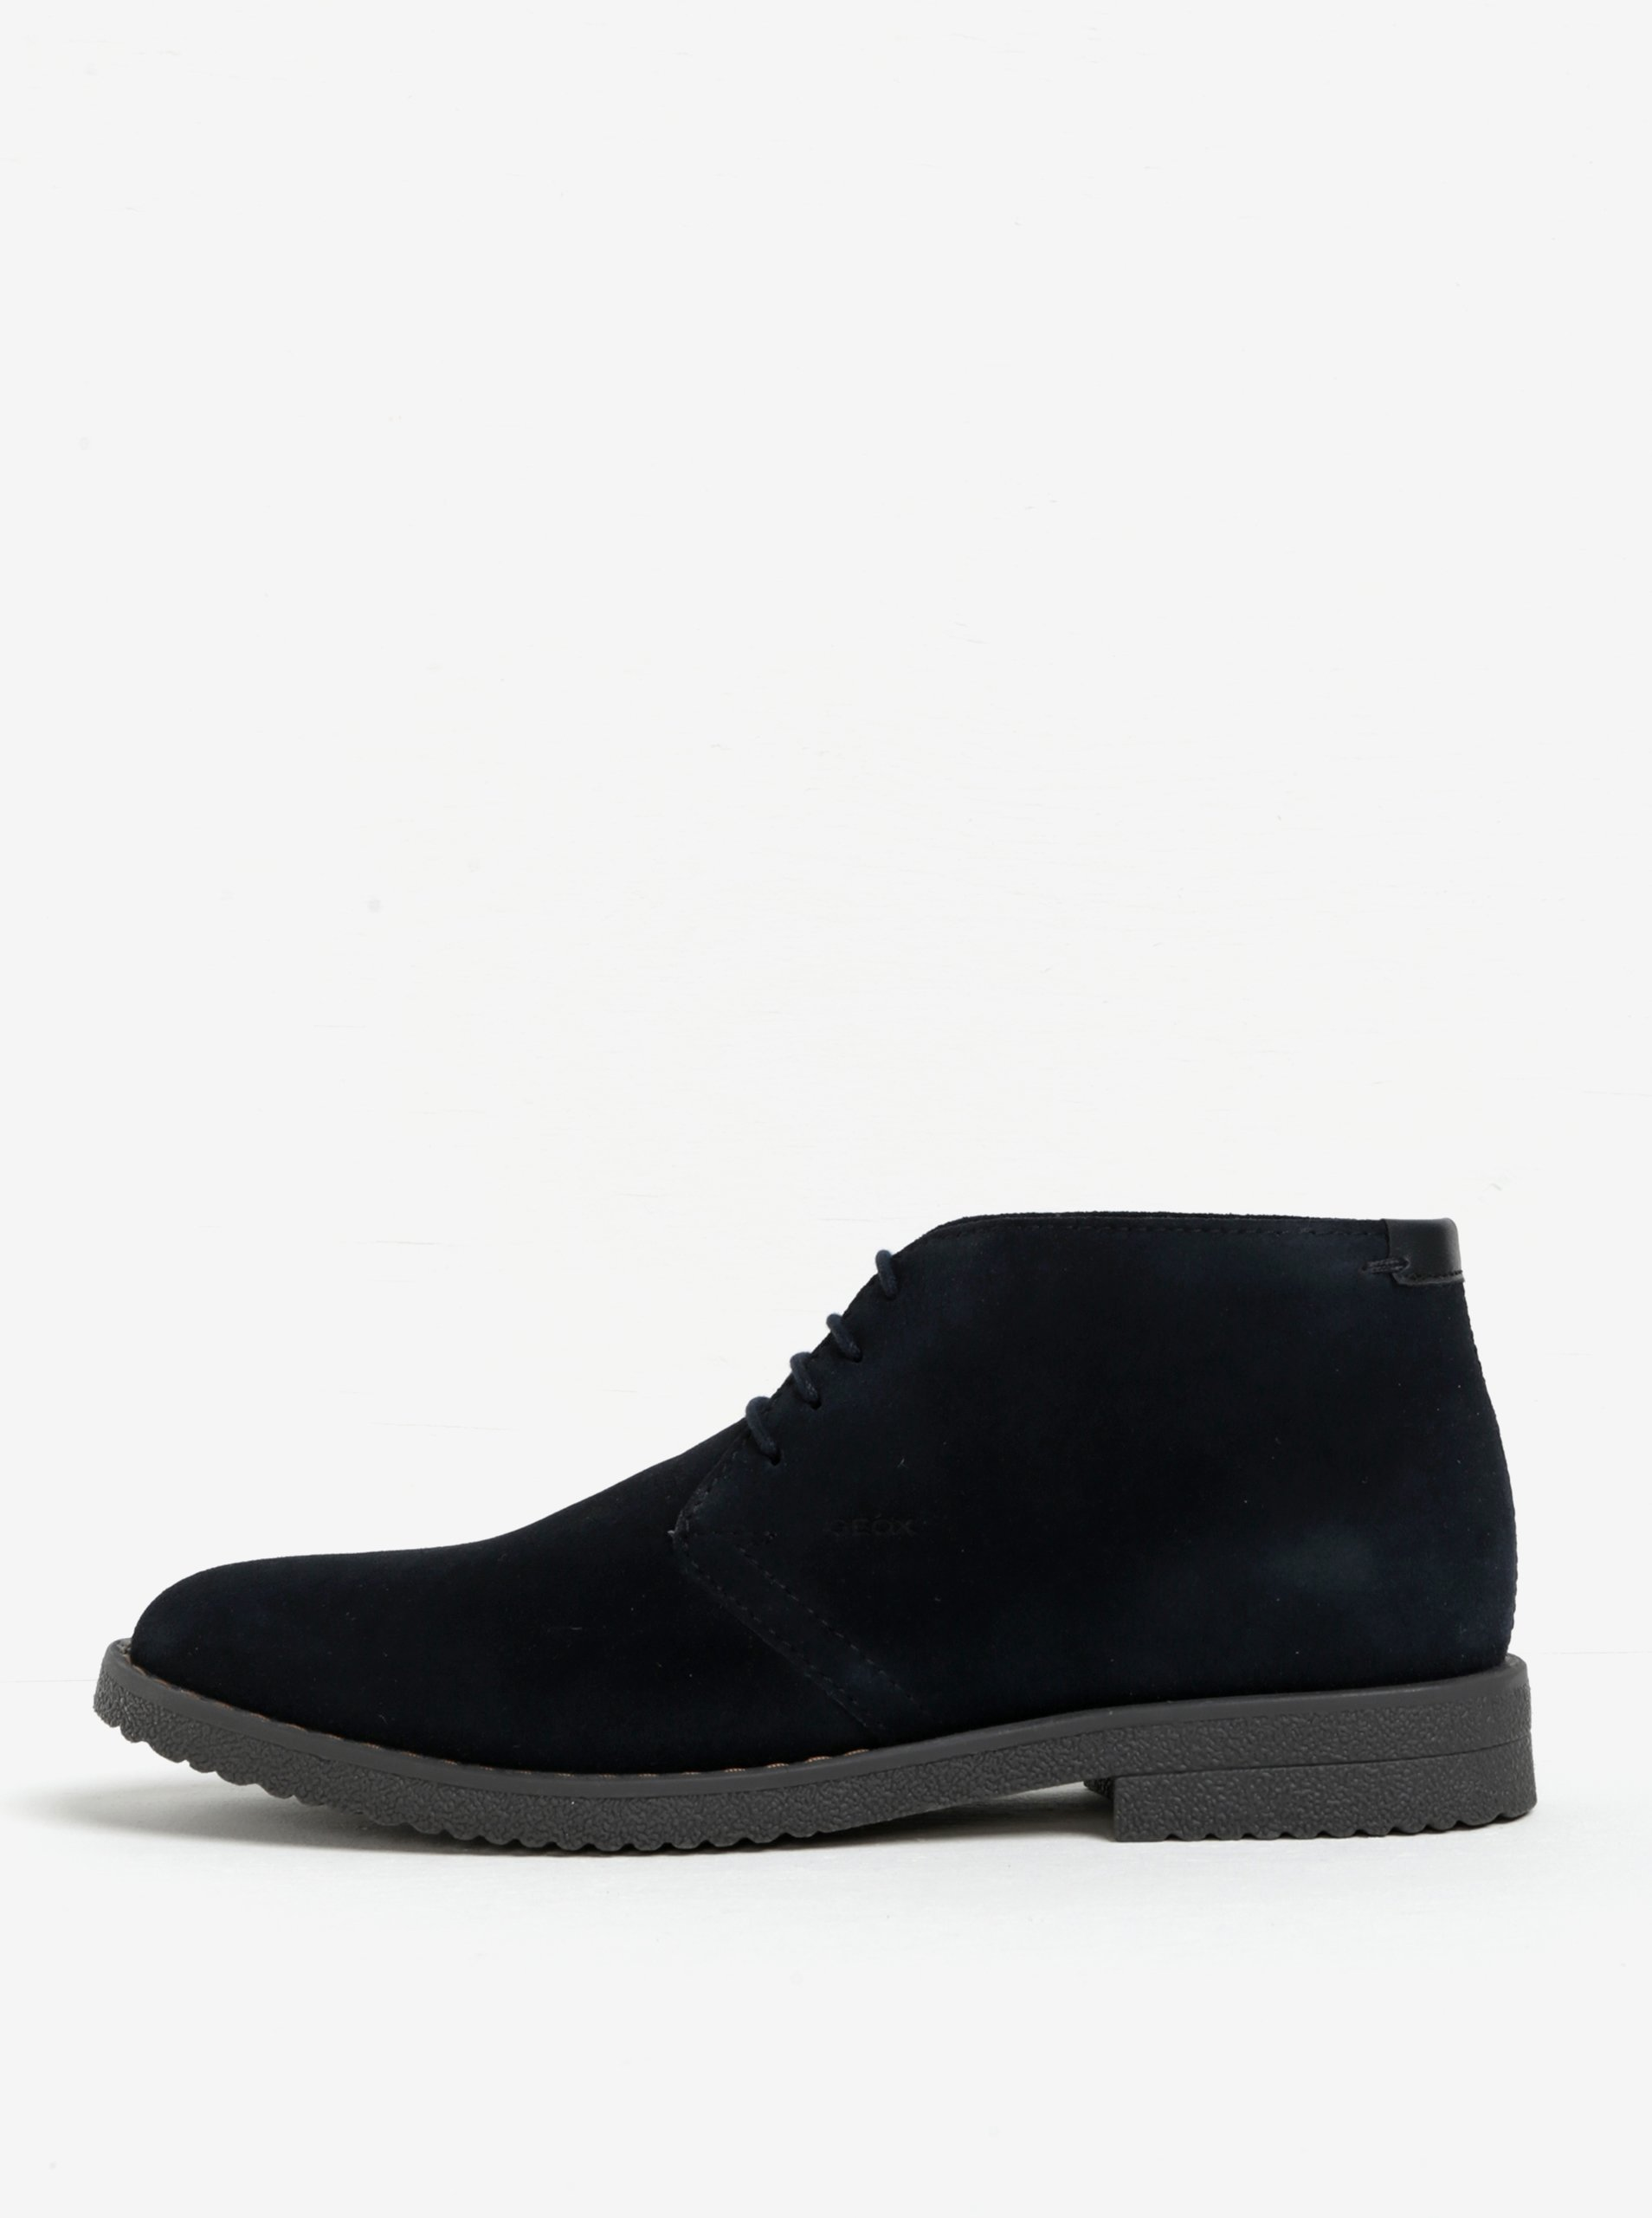 Tmavomodré pánske semišové členkové topánky Geox Brandled  842afeb1b5